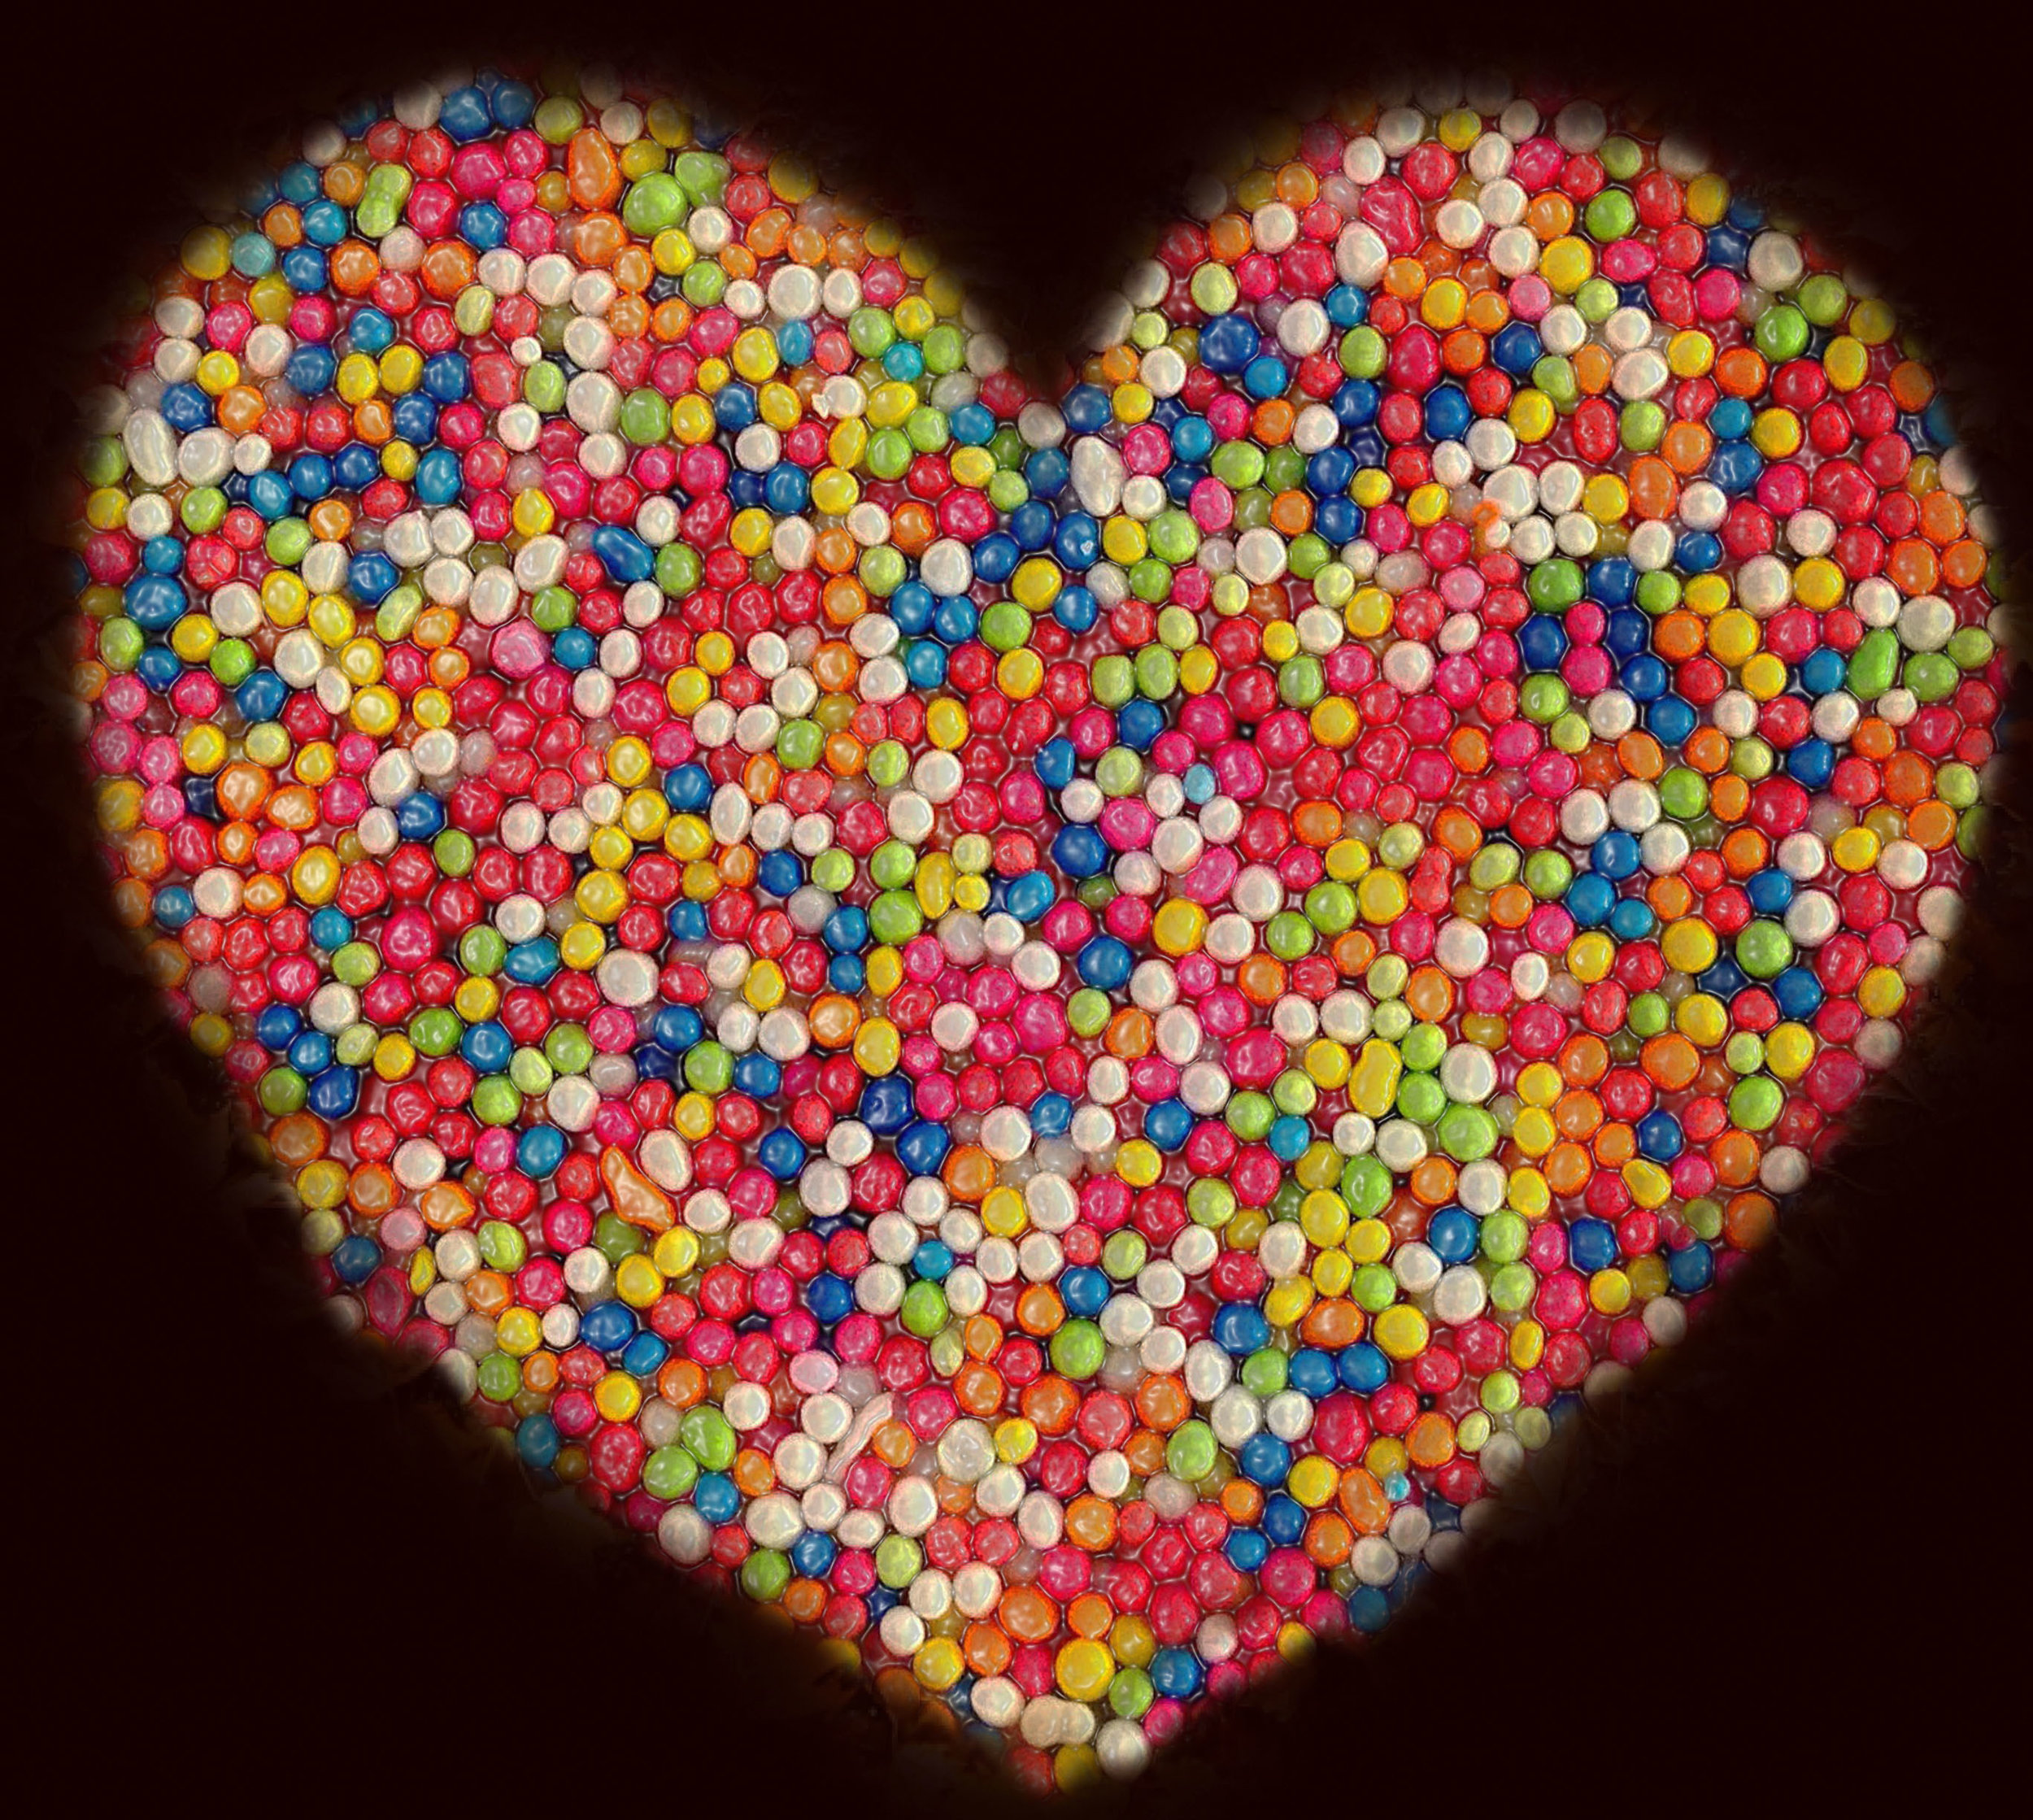 Candy heart feb 2019 blog.jpg